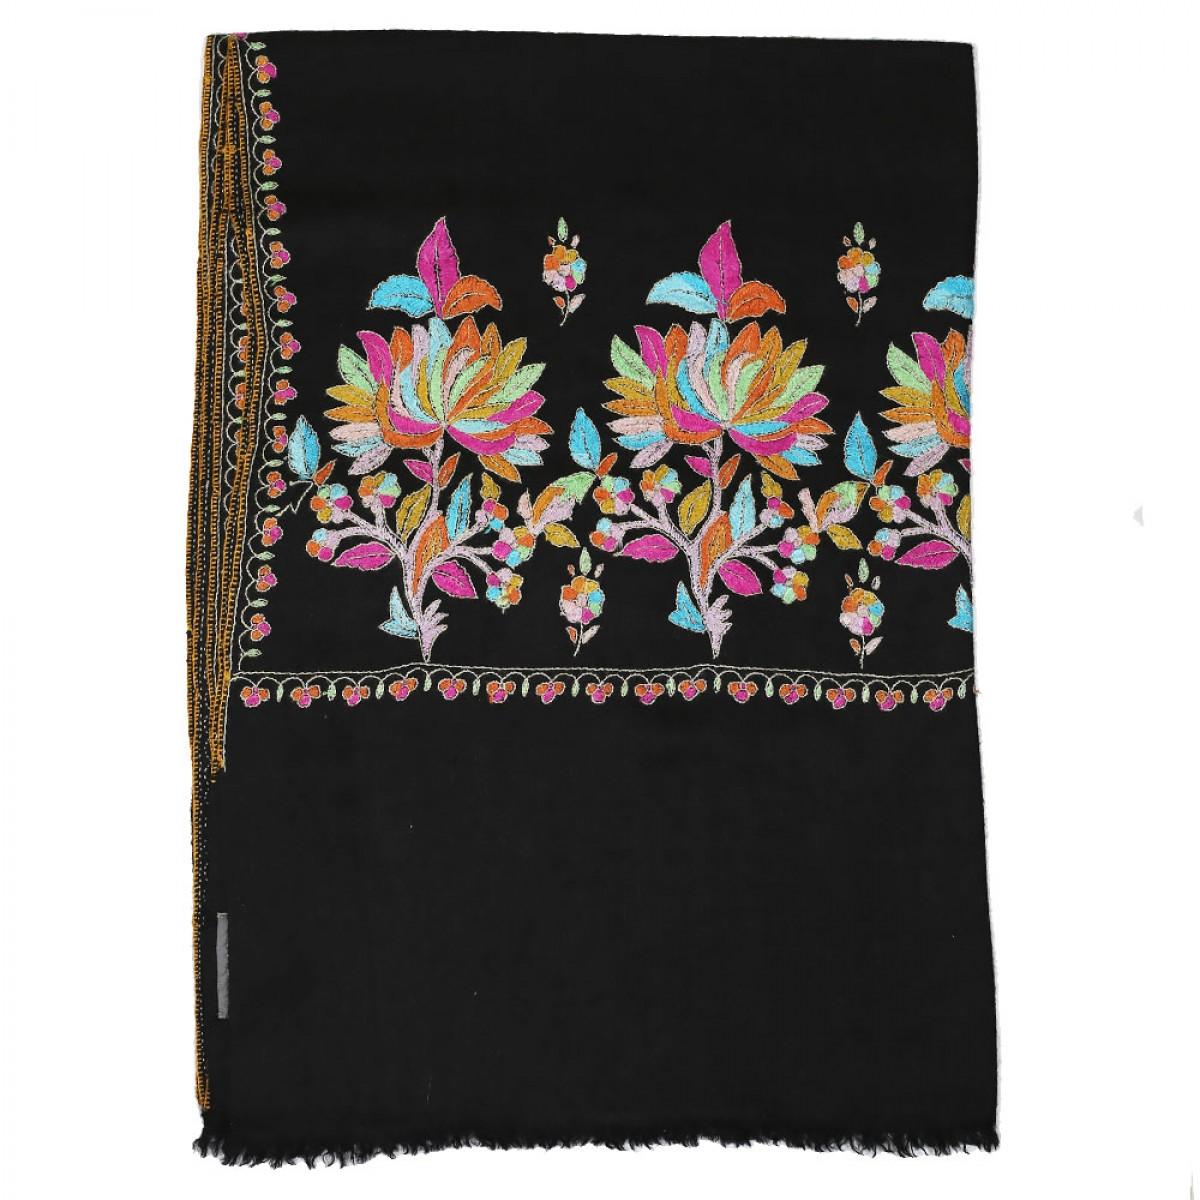 Embroidered Handloom Pashmina Stole - Black Gold